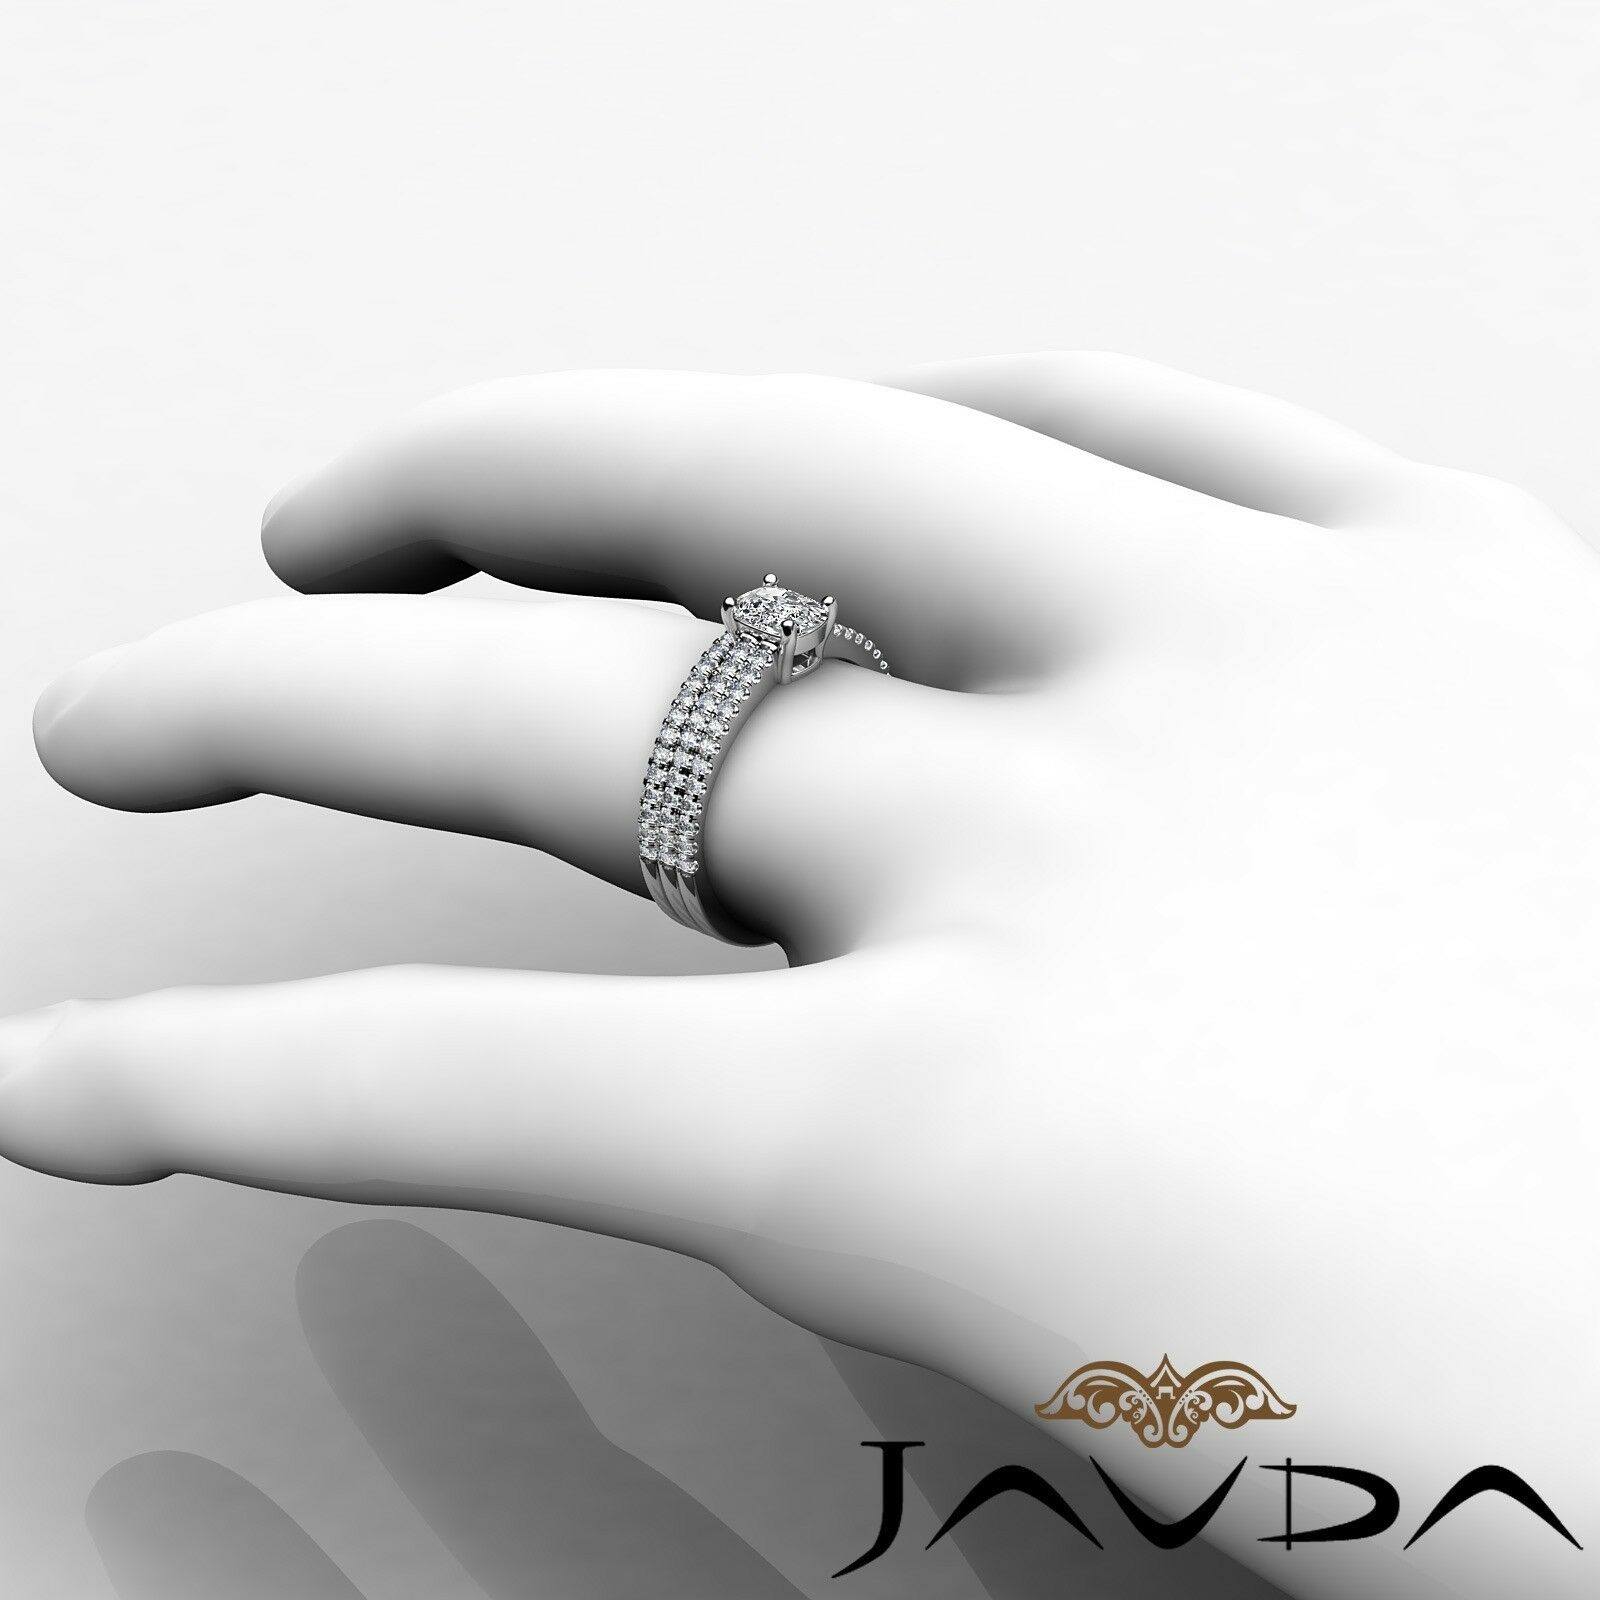 1.8ctw Bridal Scalloped Pave Cushion Diamond Engagement Ring GIA F-VVS2 W Gold 5